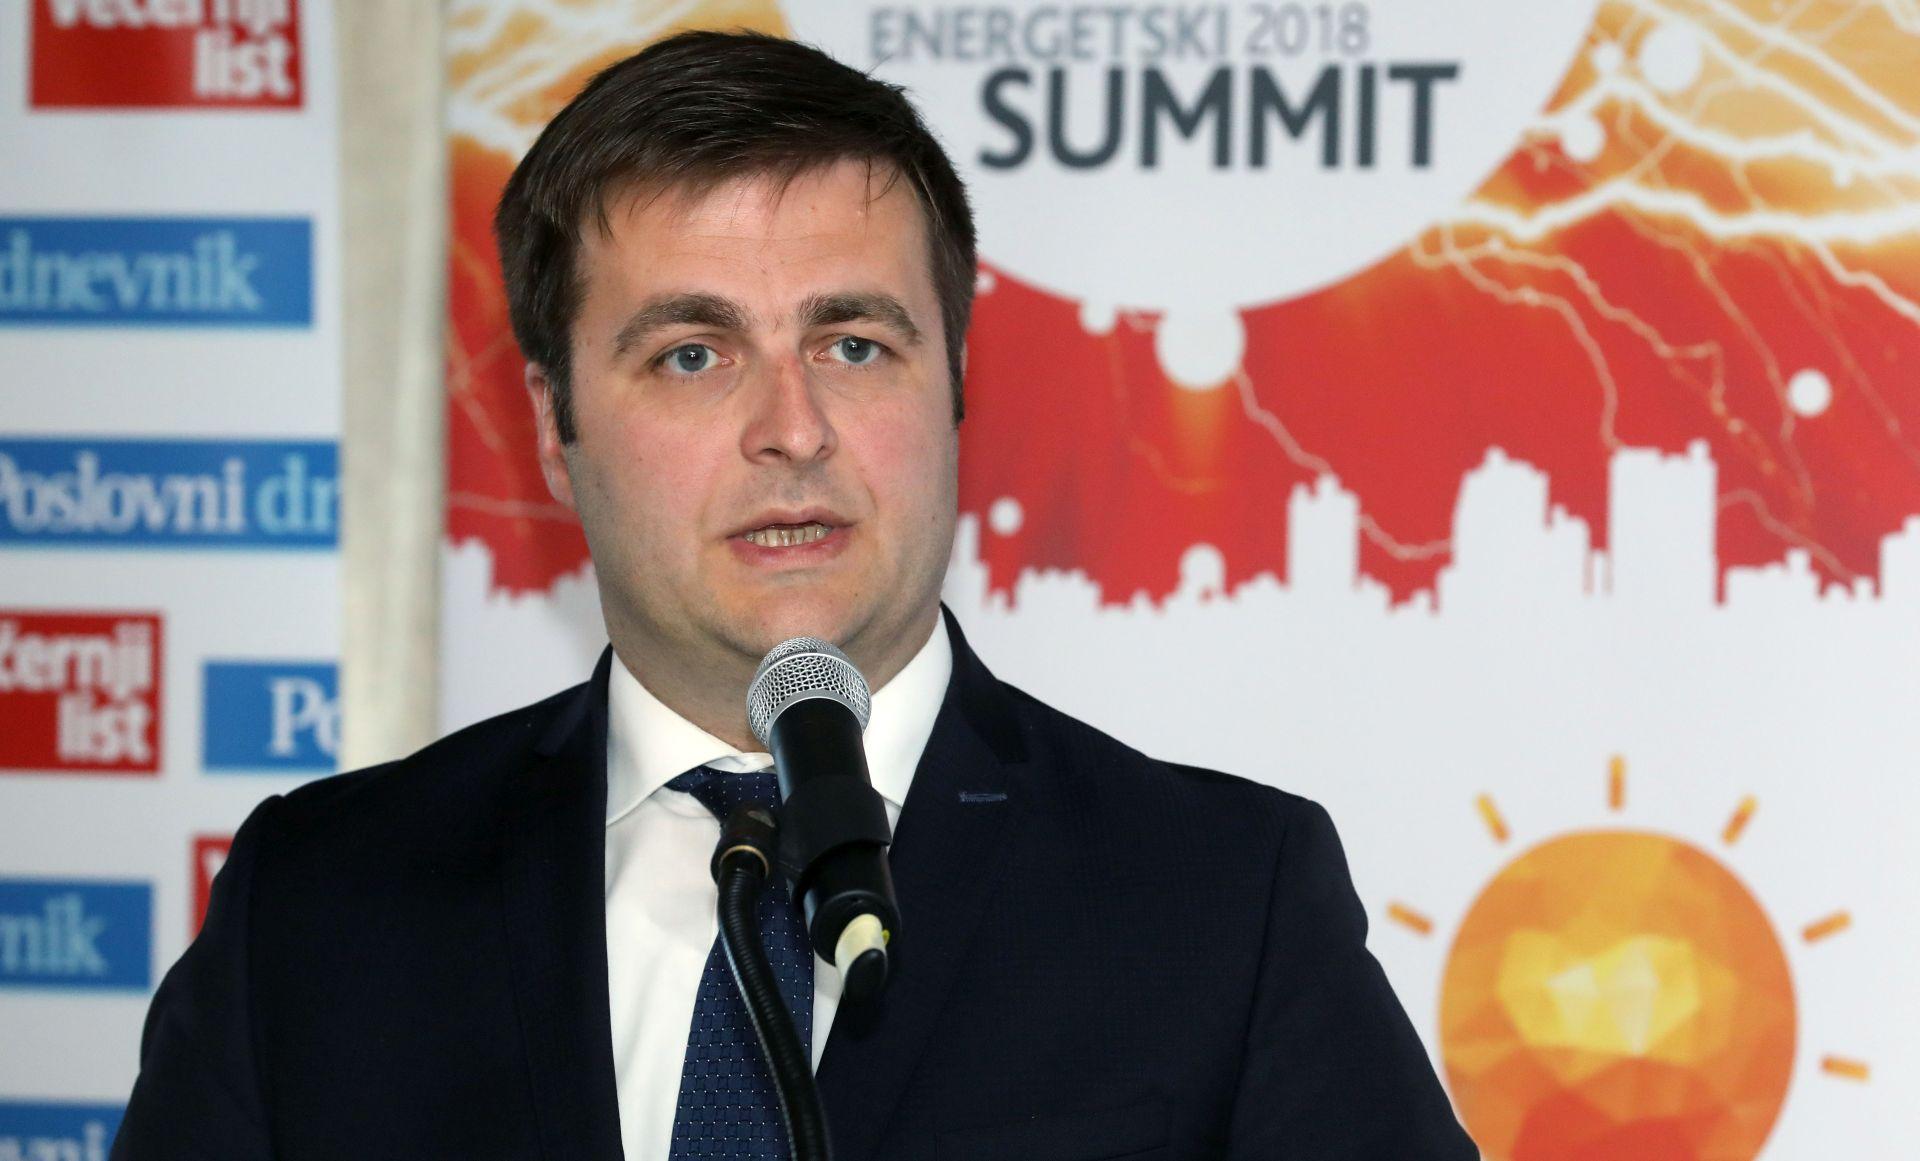 'Nisam kandidat za novog ministra gospodarstva'